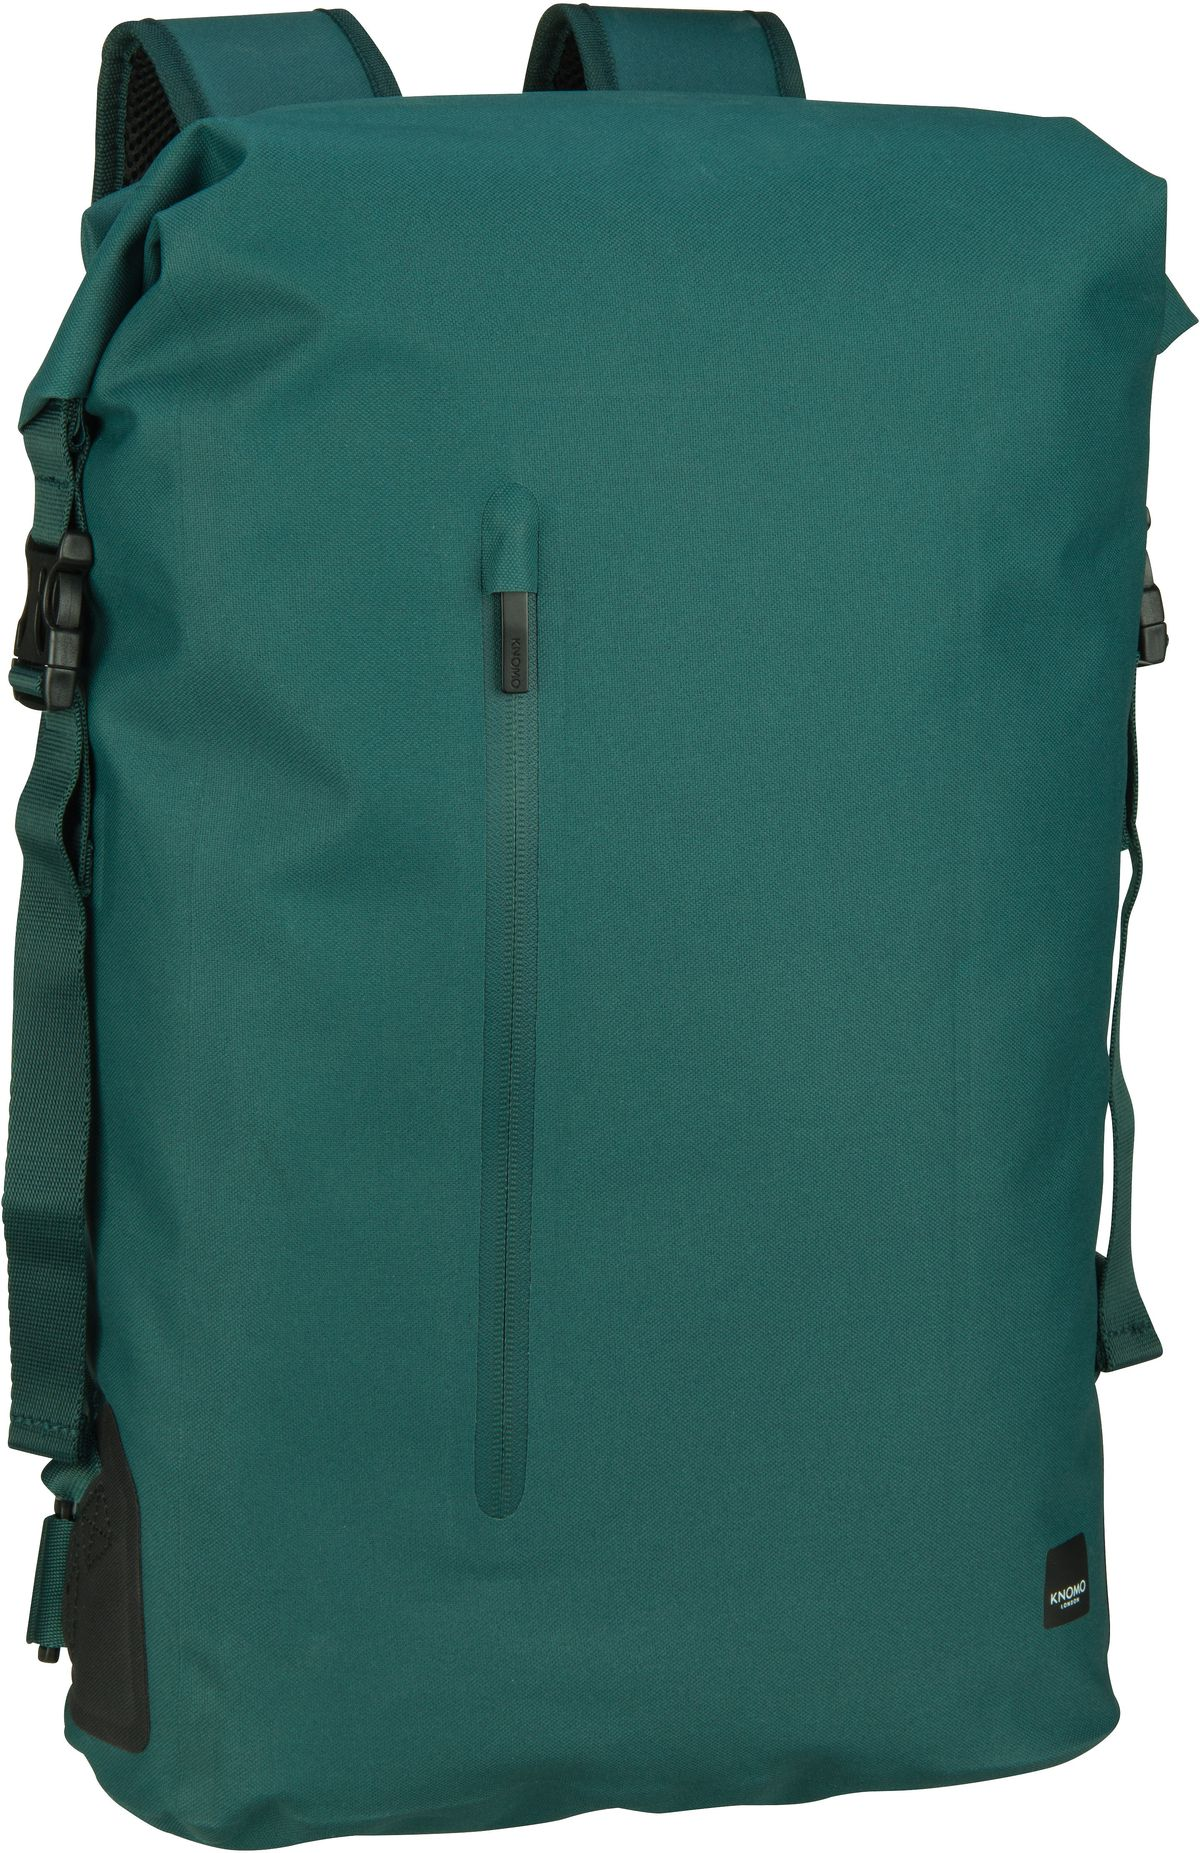 Rucksack / Daypack Thames Cromwell 14'' Alpine Green (27.5 Liter)